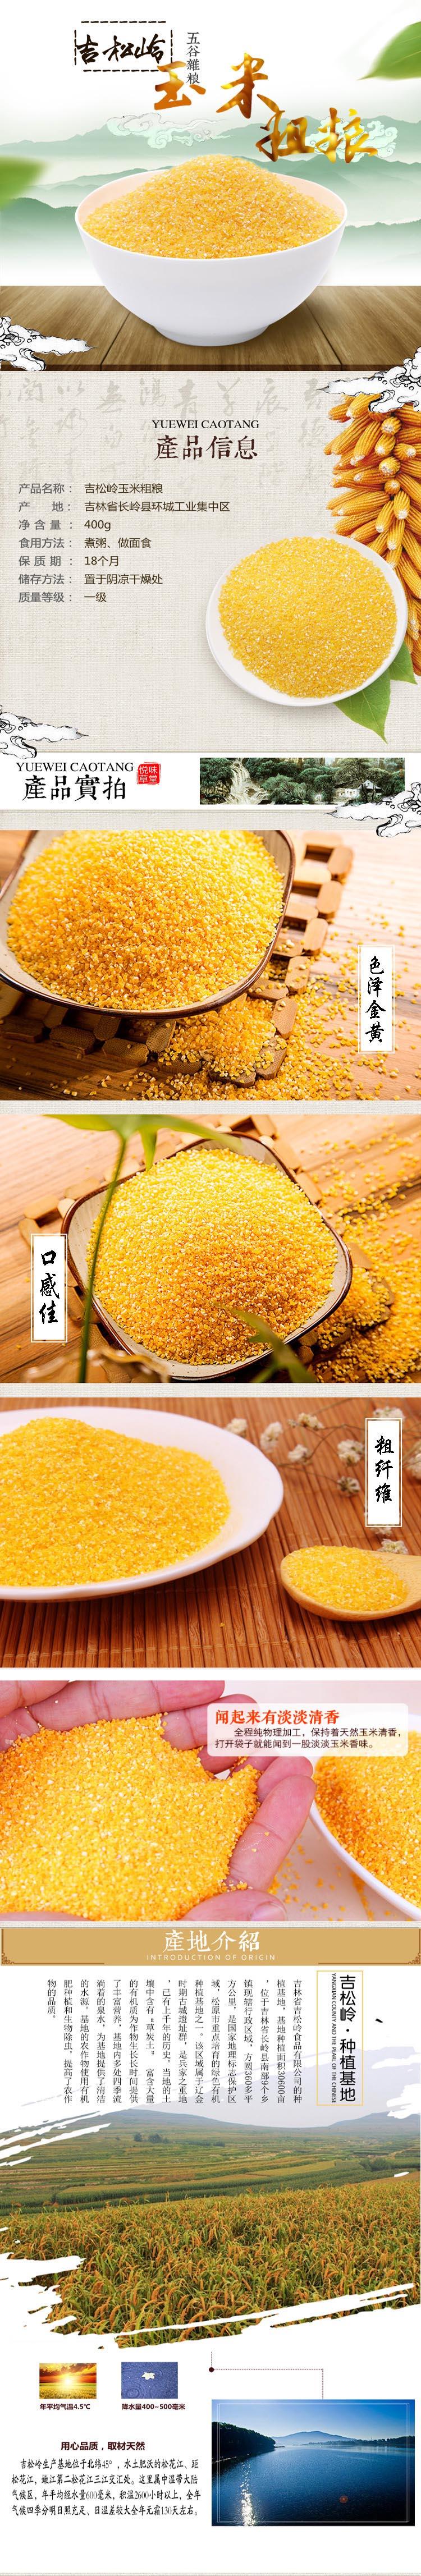 400g玉米粗糧詳情圖容易購1m